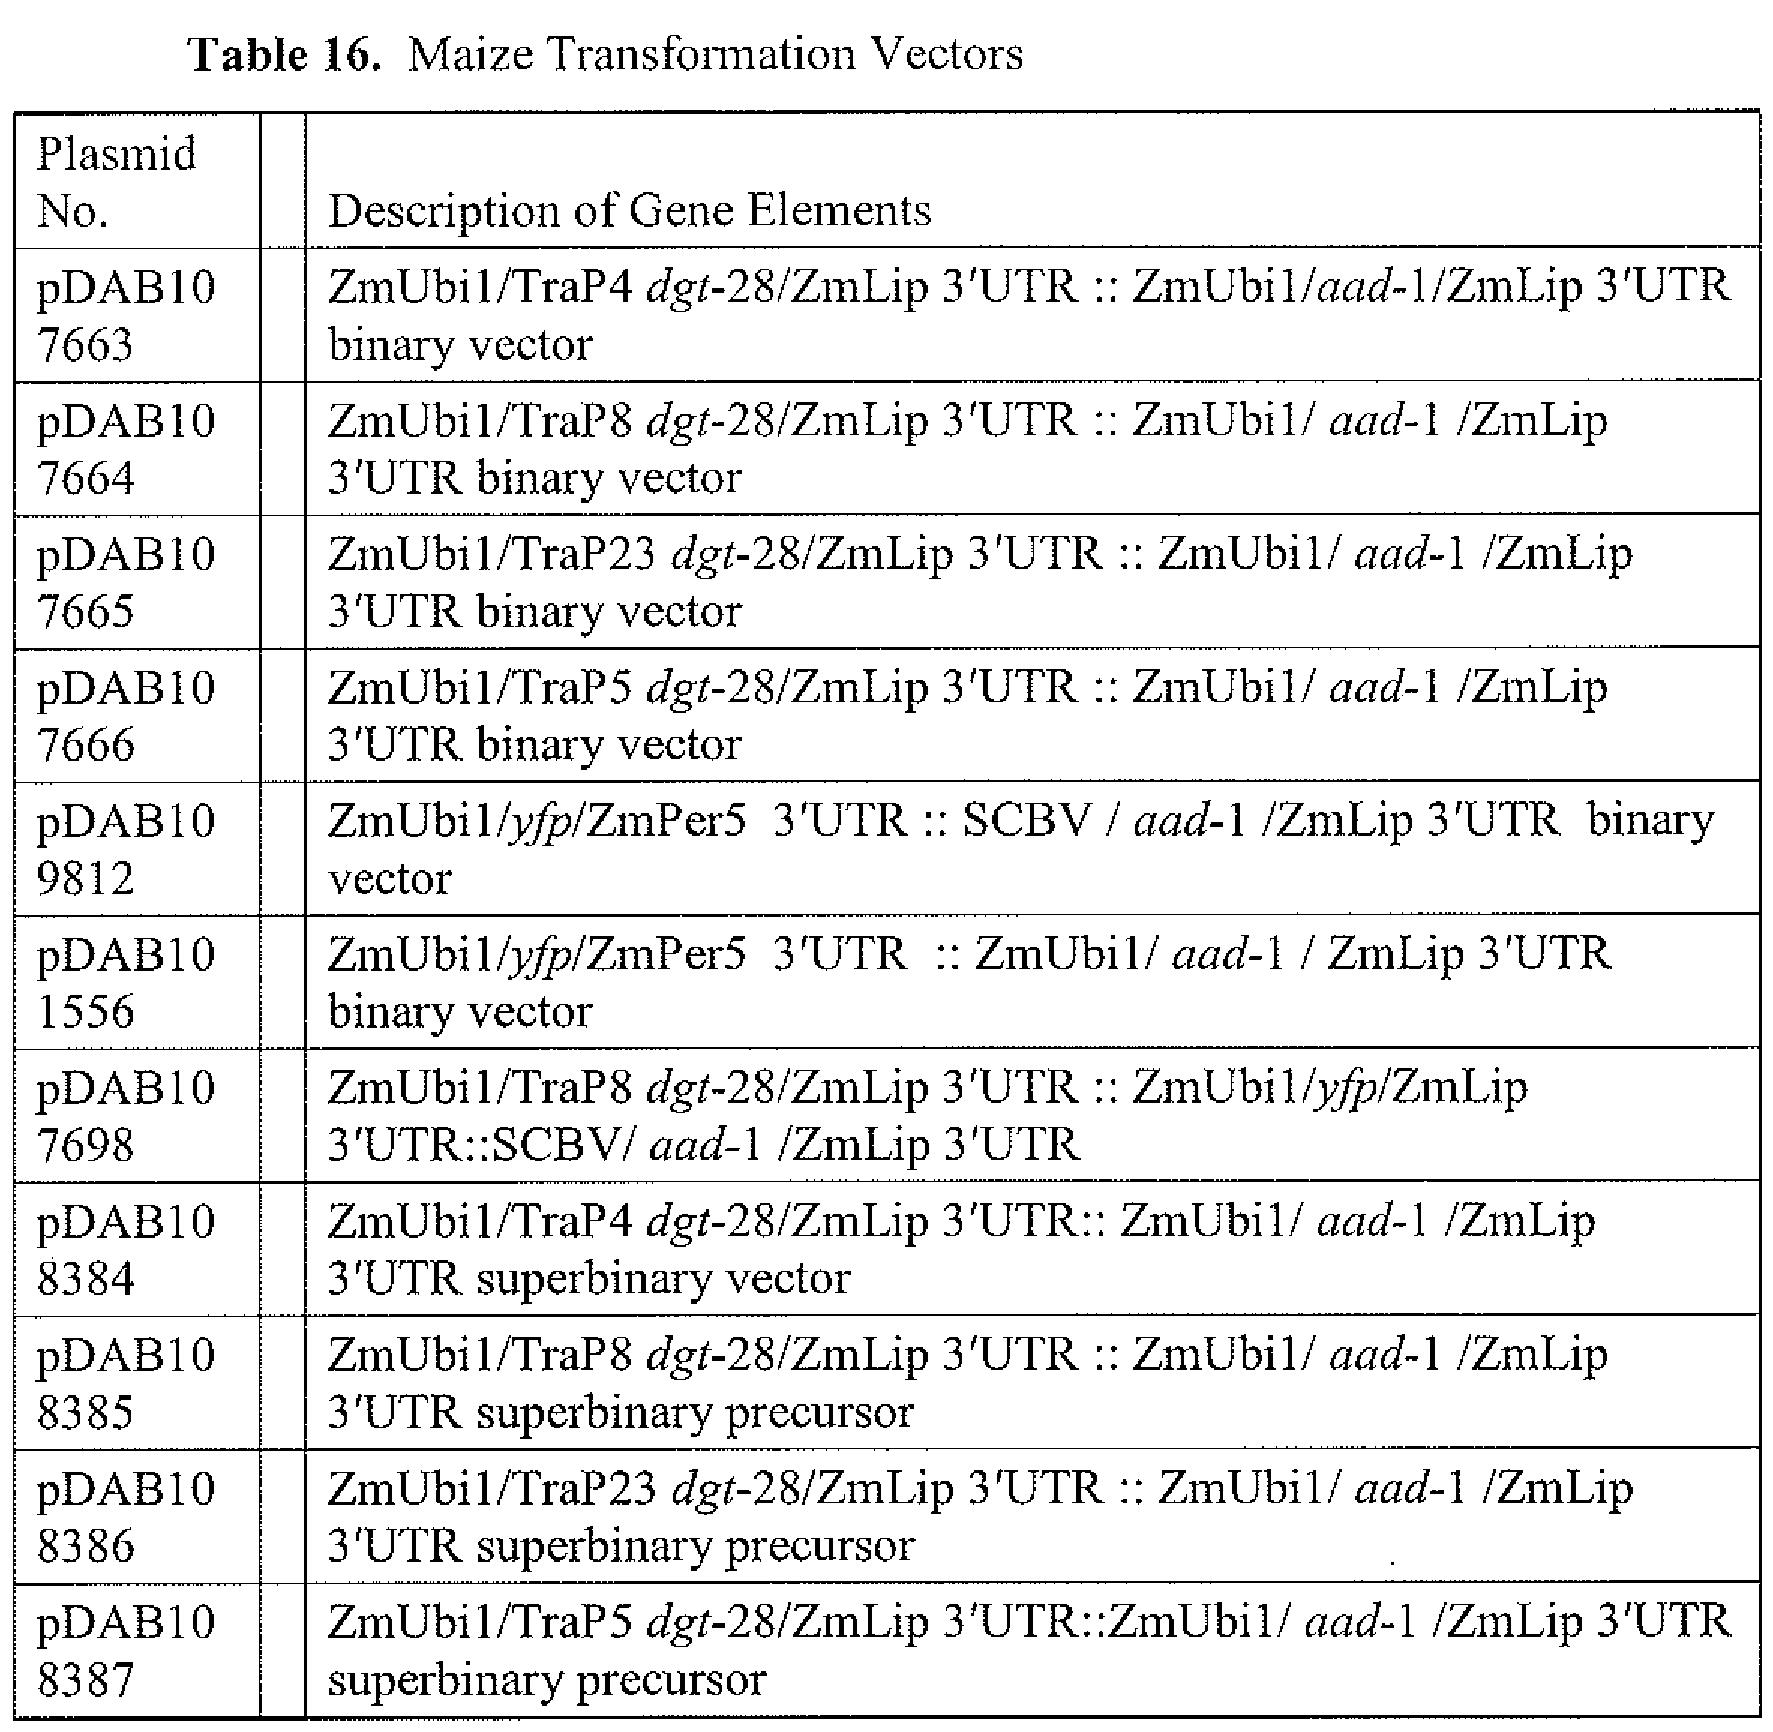 marketsworld binary options review